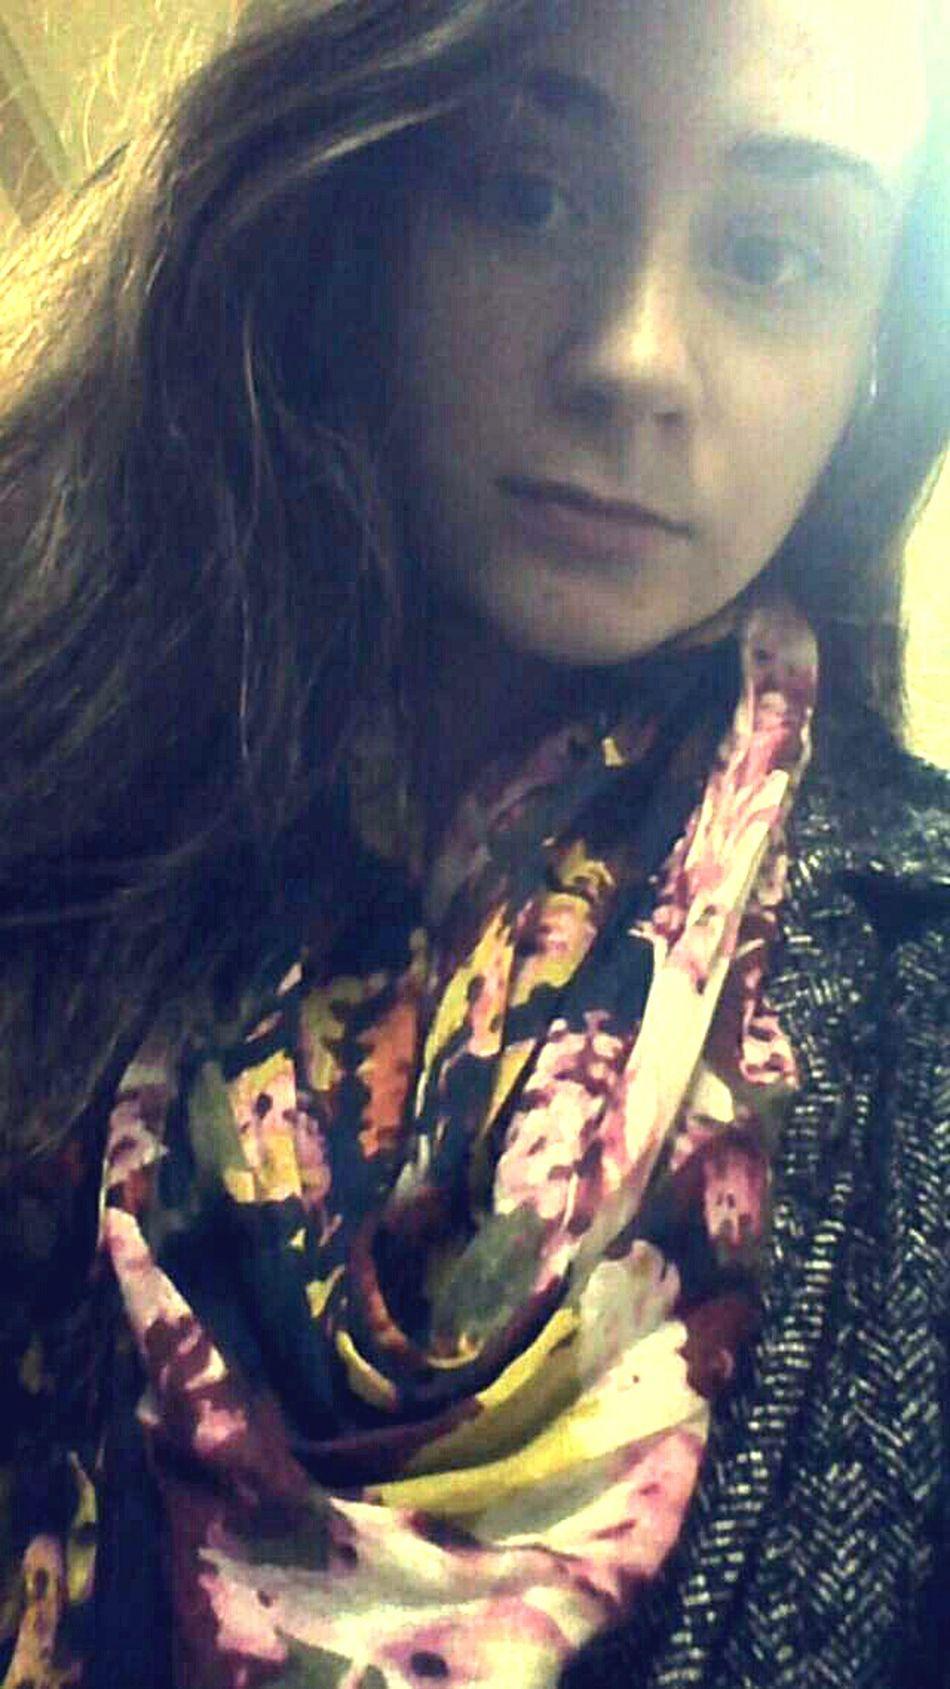 Greek Style Greek Girl Its Me! Thats Me! My Hair Sassy!!!! BORED! Pokerface